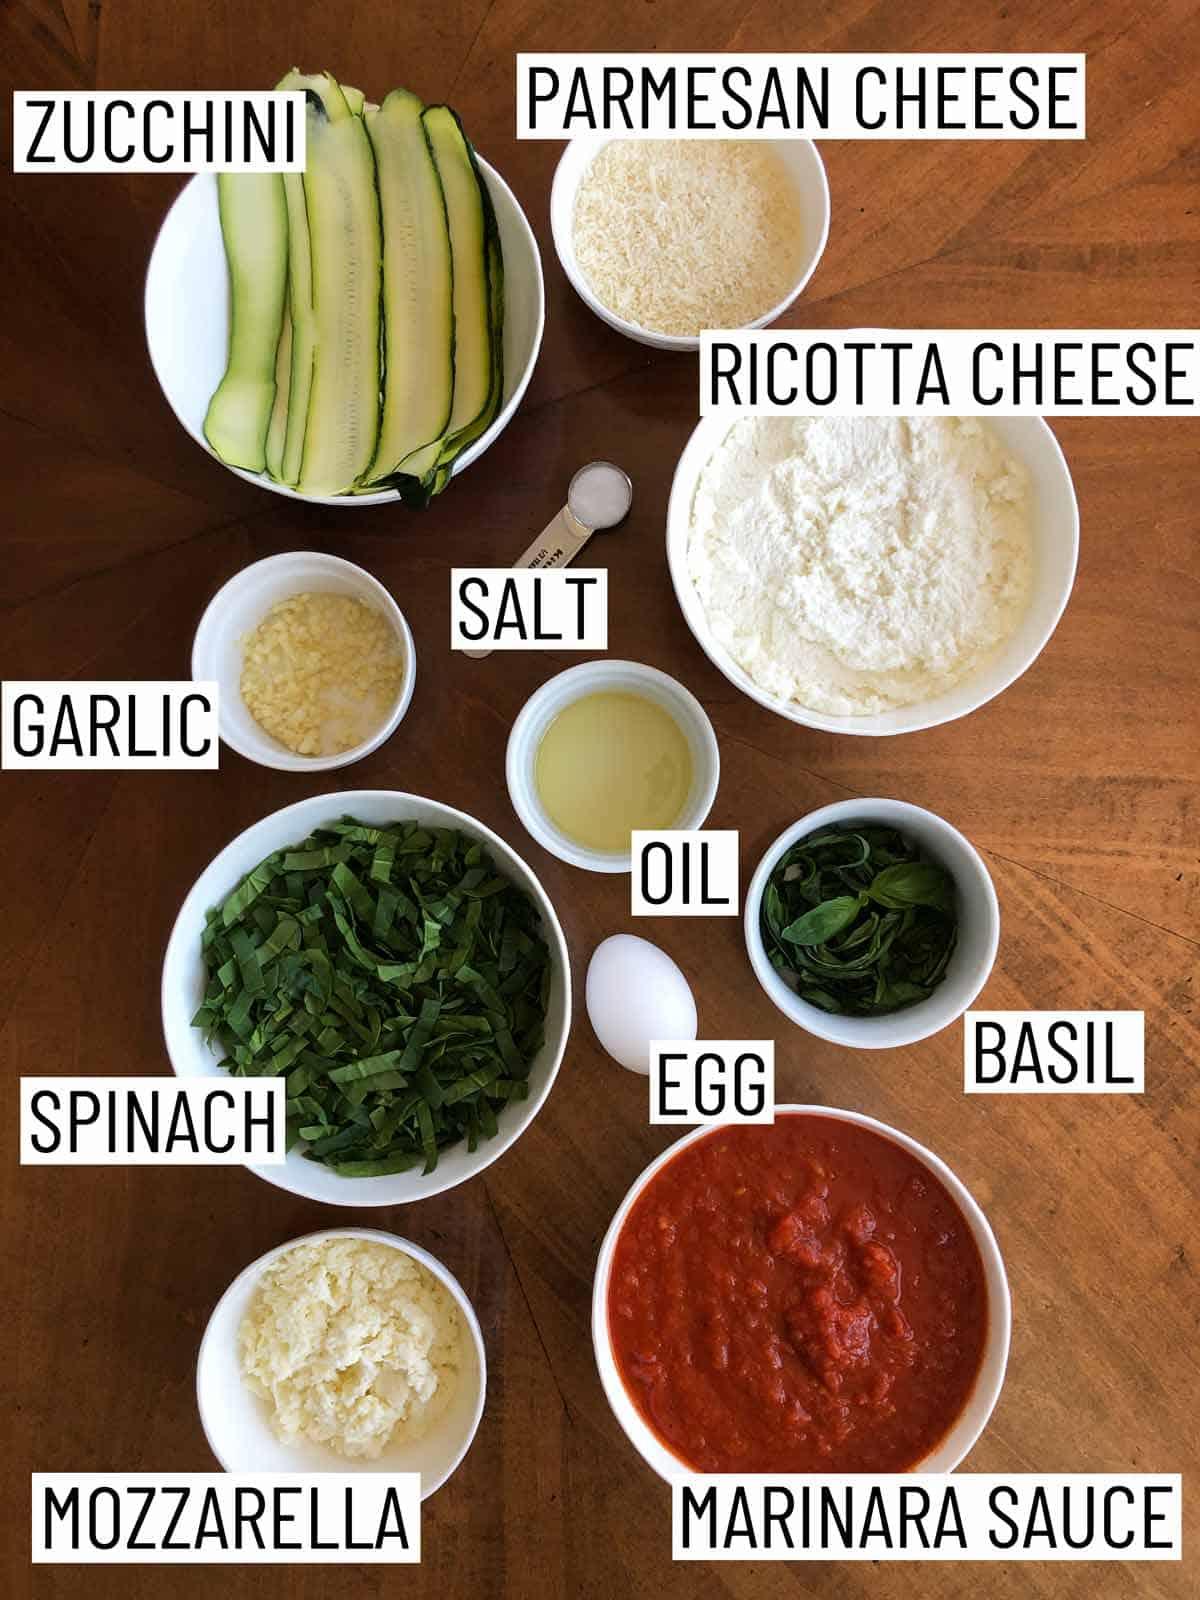 Overhead image of ingredients: zucchini, parmesan cheese, ricotta cheese, salt, oil, basil, egg, marinara sauce, mozzarella, spinach, and garlic.